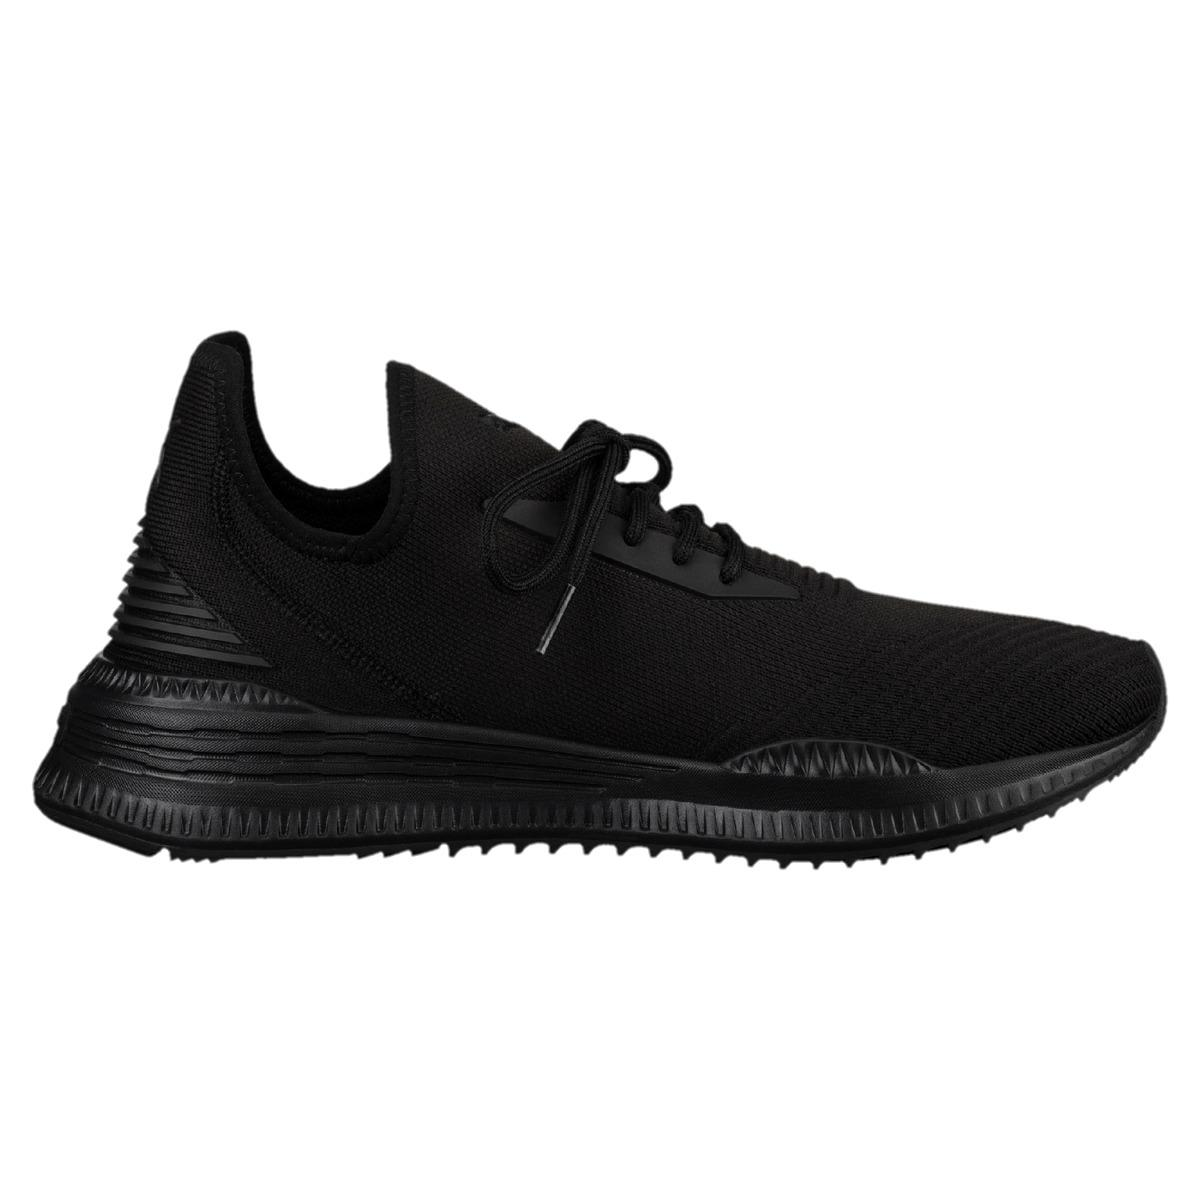 Black Avid Evoknit sneaker Puma Pre Order Discount Cost Buy Cheap Fashionable Clearance Amazon Shop For Cheap Price ZHGj3wnJ